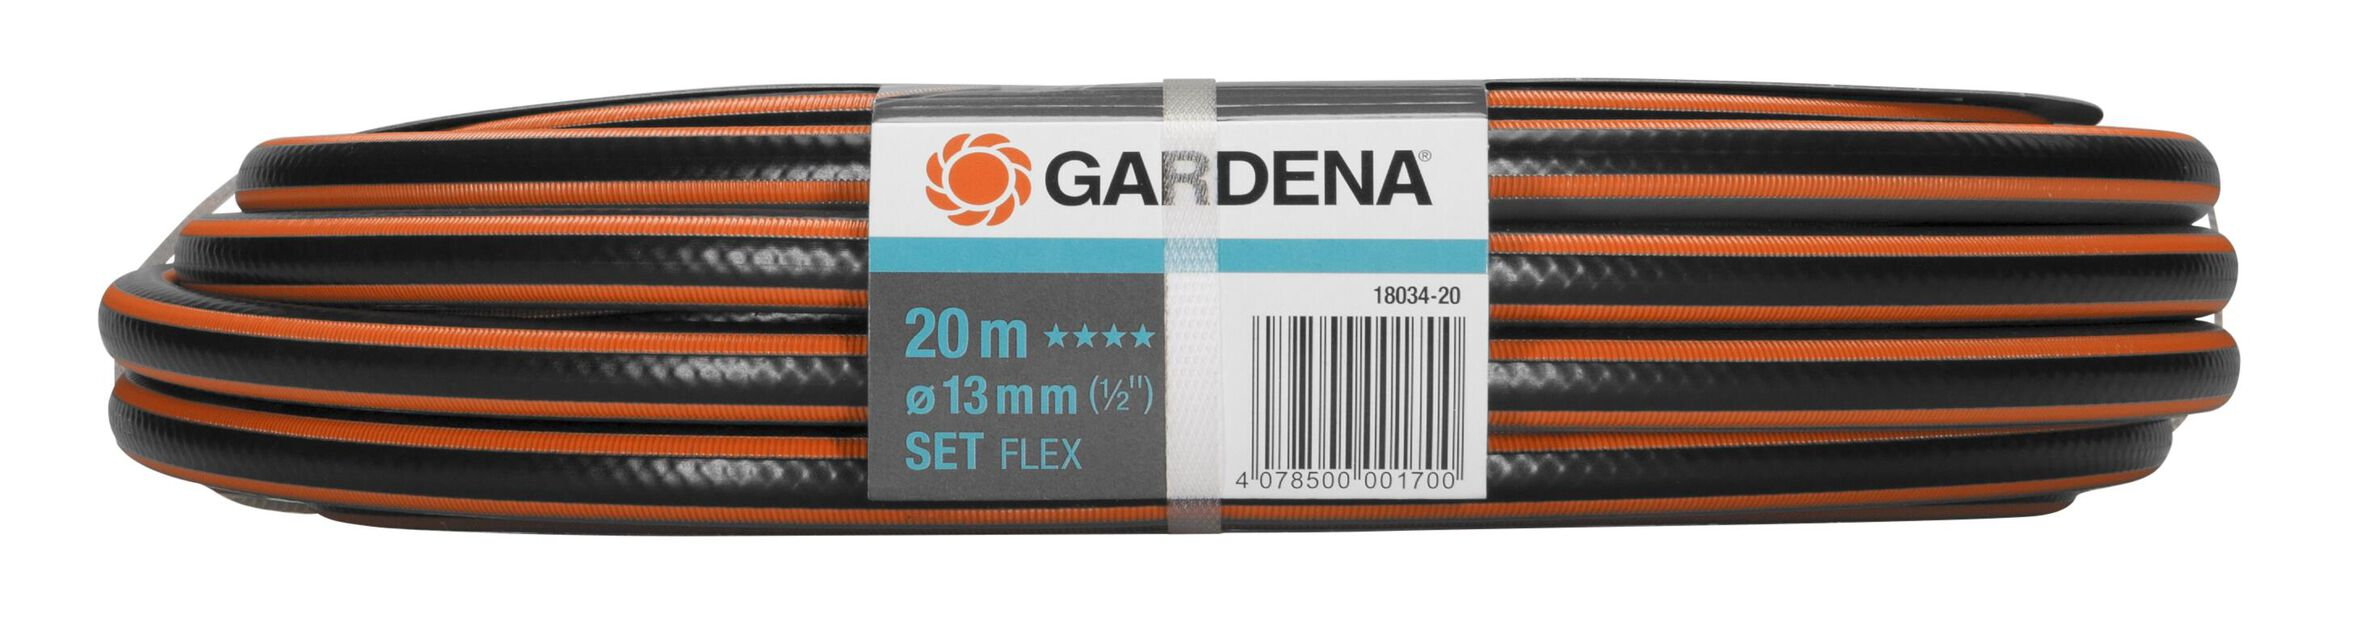 Letku Flex 13Mm 20M + Liitin Gardena, 20 ml